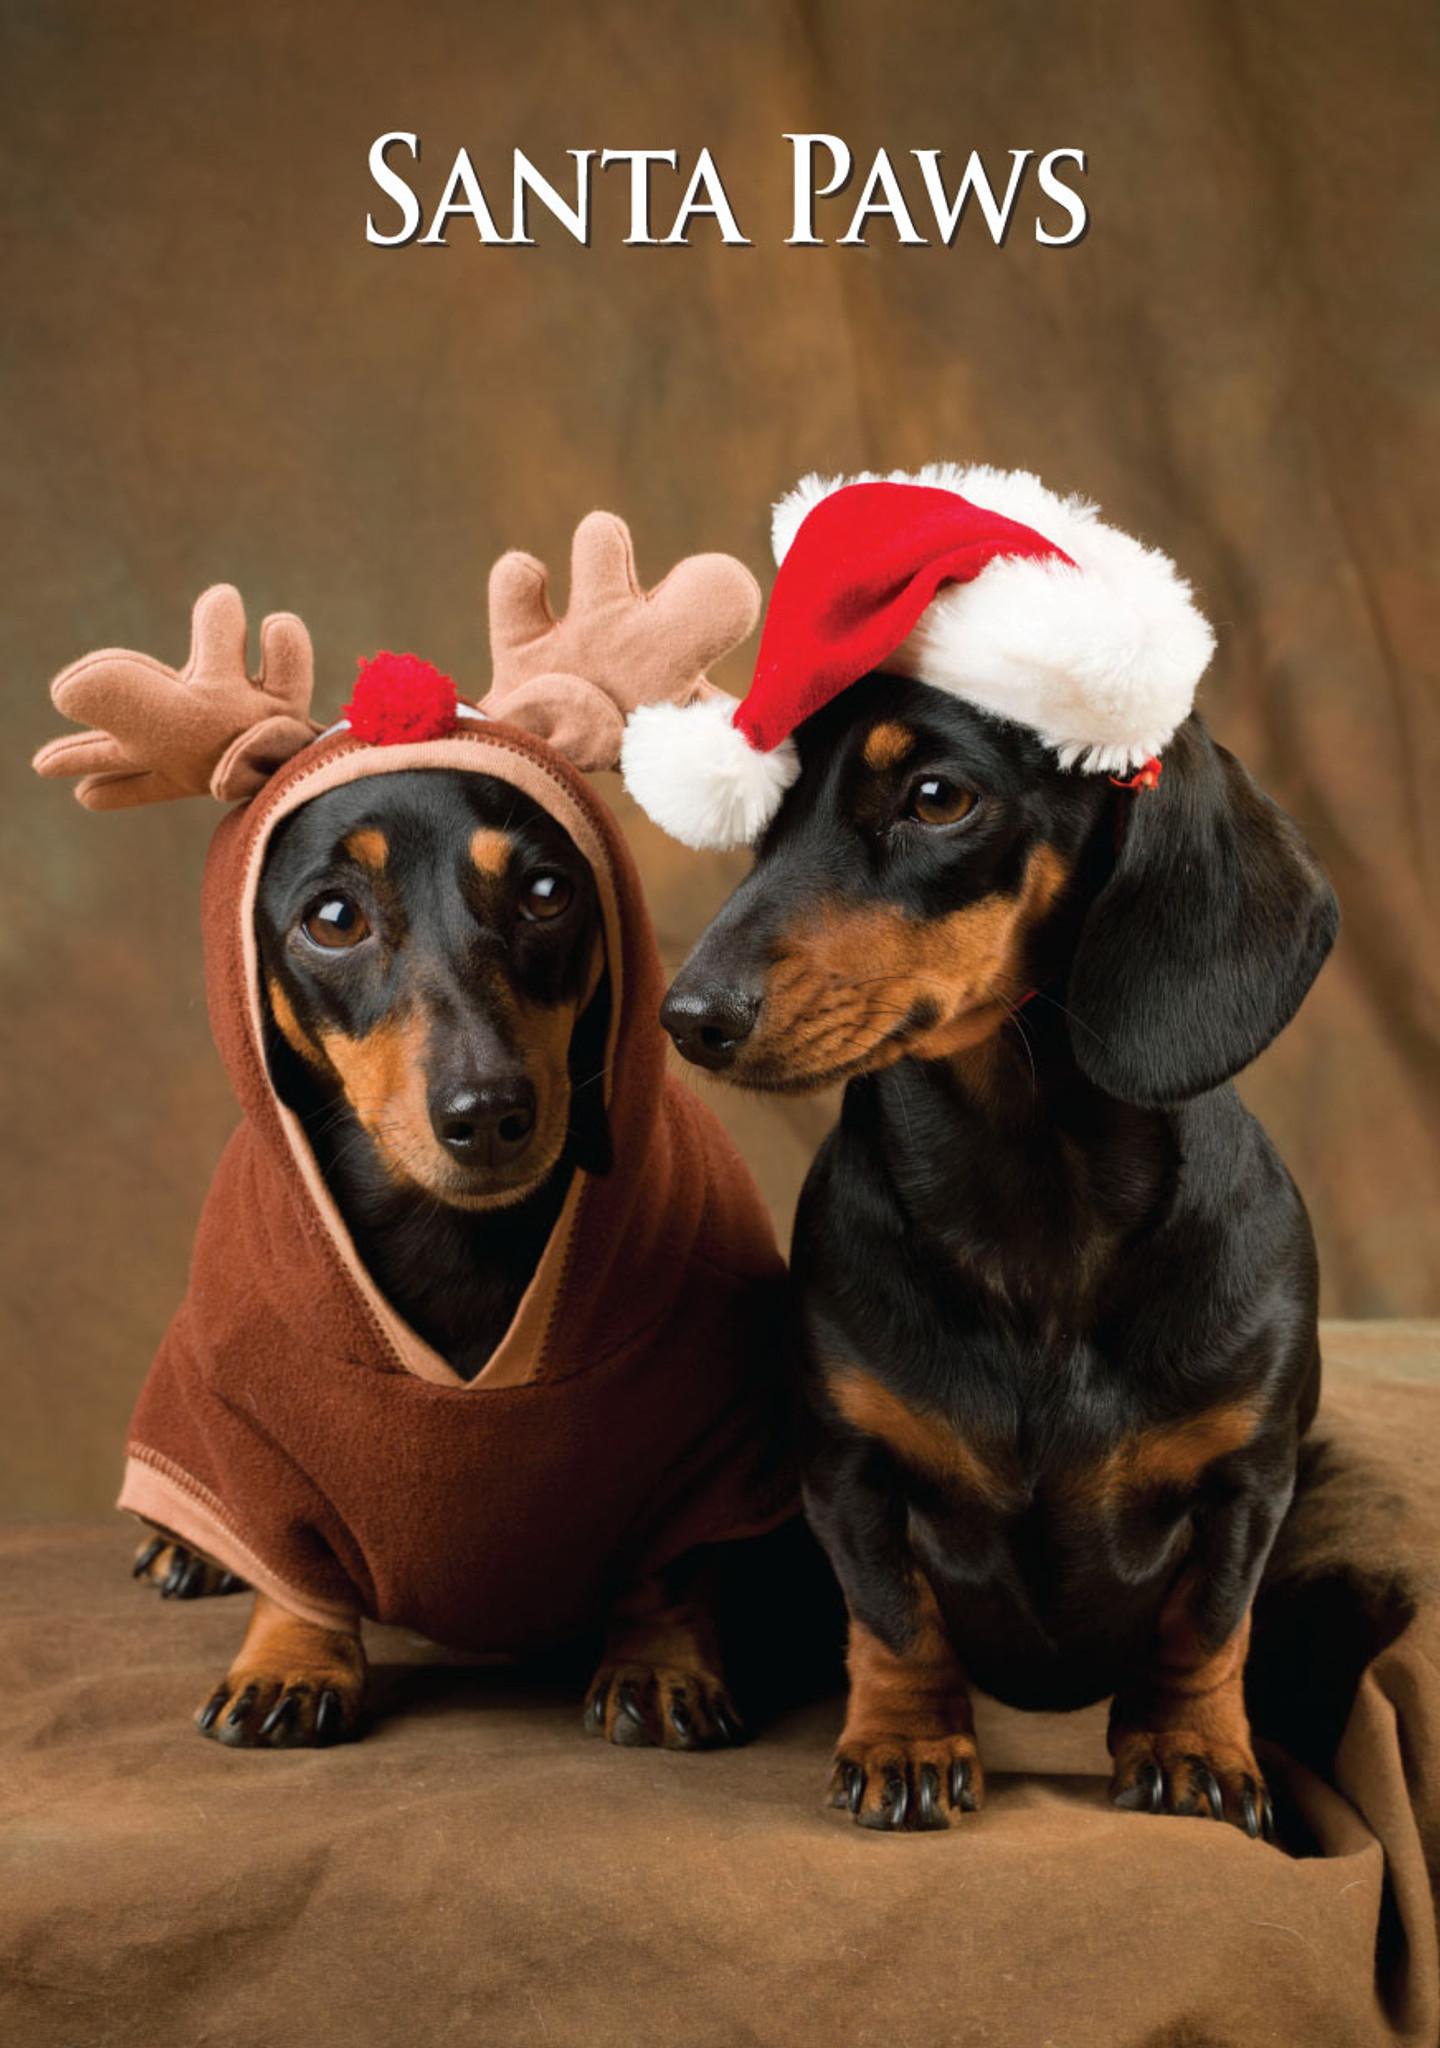 Miniature dachshund pair santa paws greeting card csp from miniature dachshund pair santa paws greeting card kristyandbryce Image collections